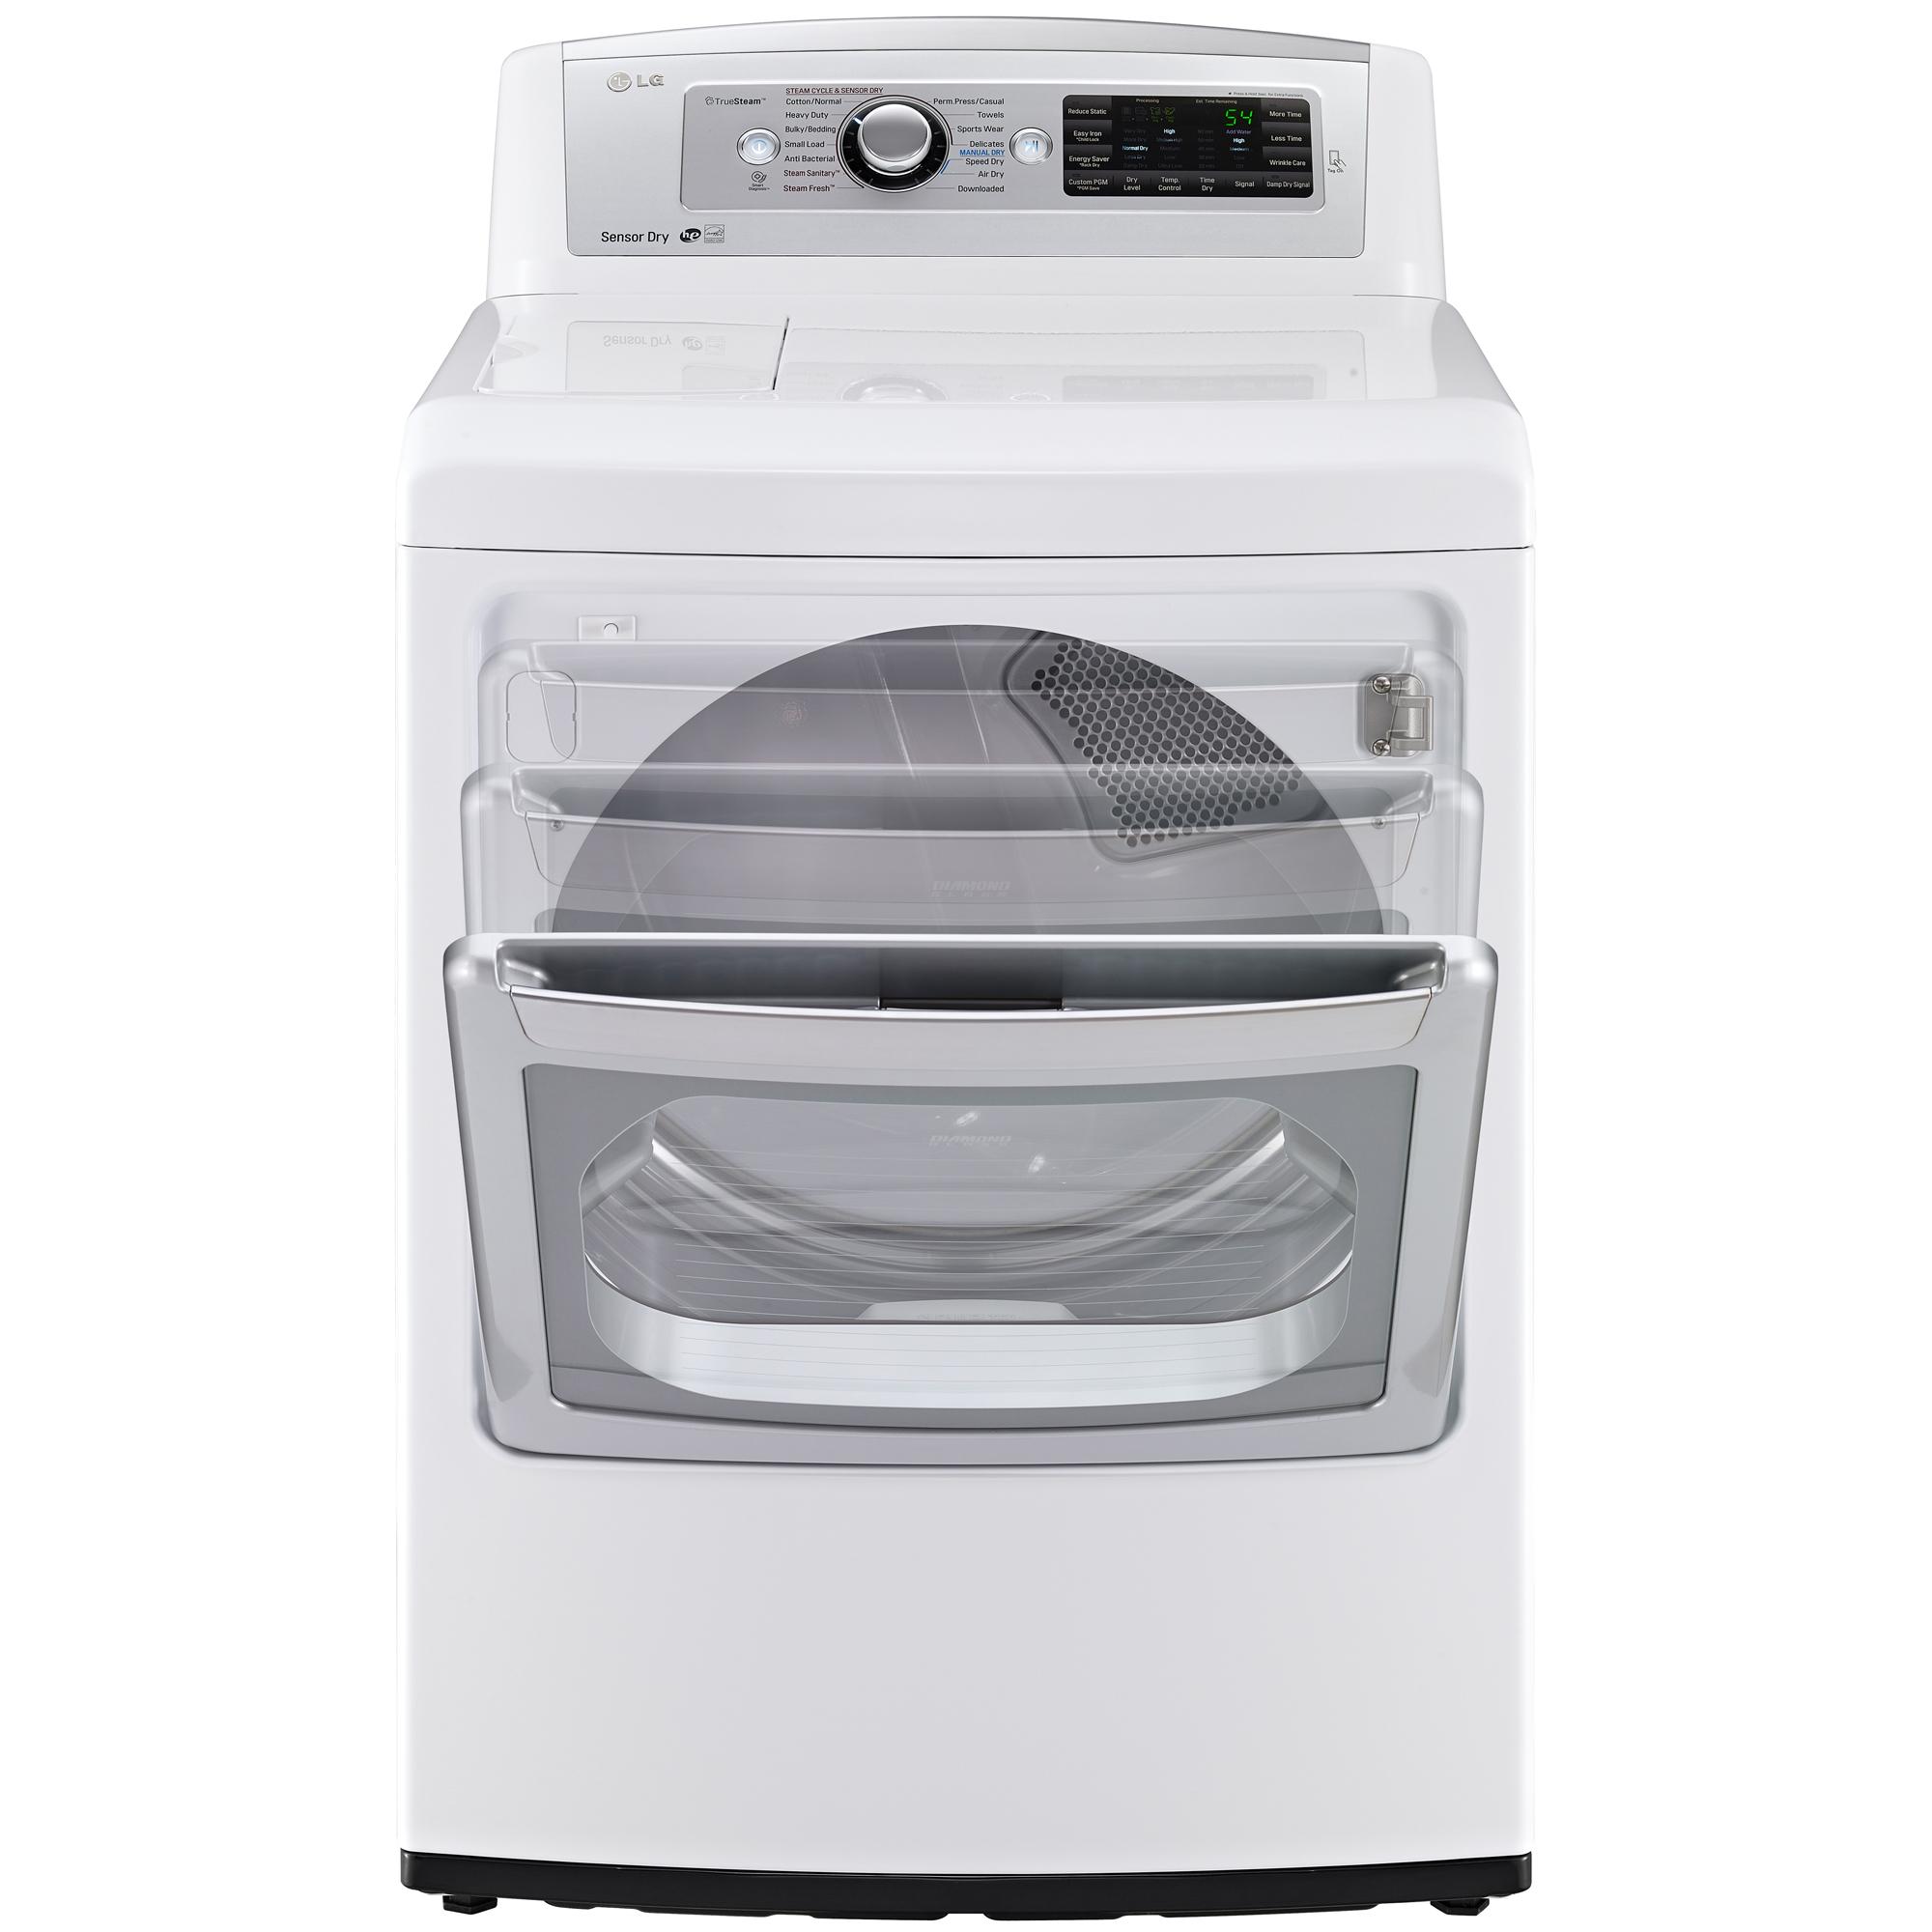 LG DLEX5780WE 7.3 cu. ft. Steam Electric Dryer w/ EasyLoad™ Door - White